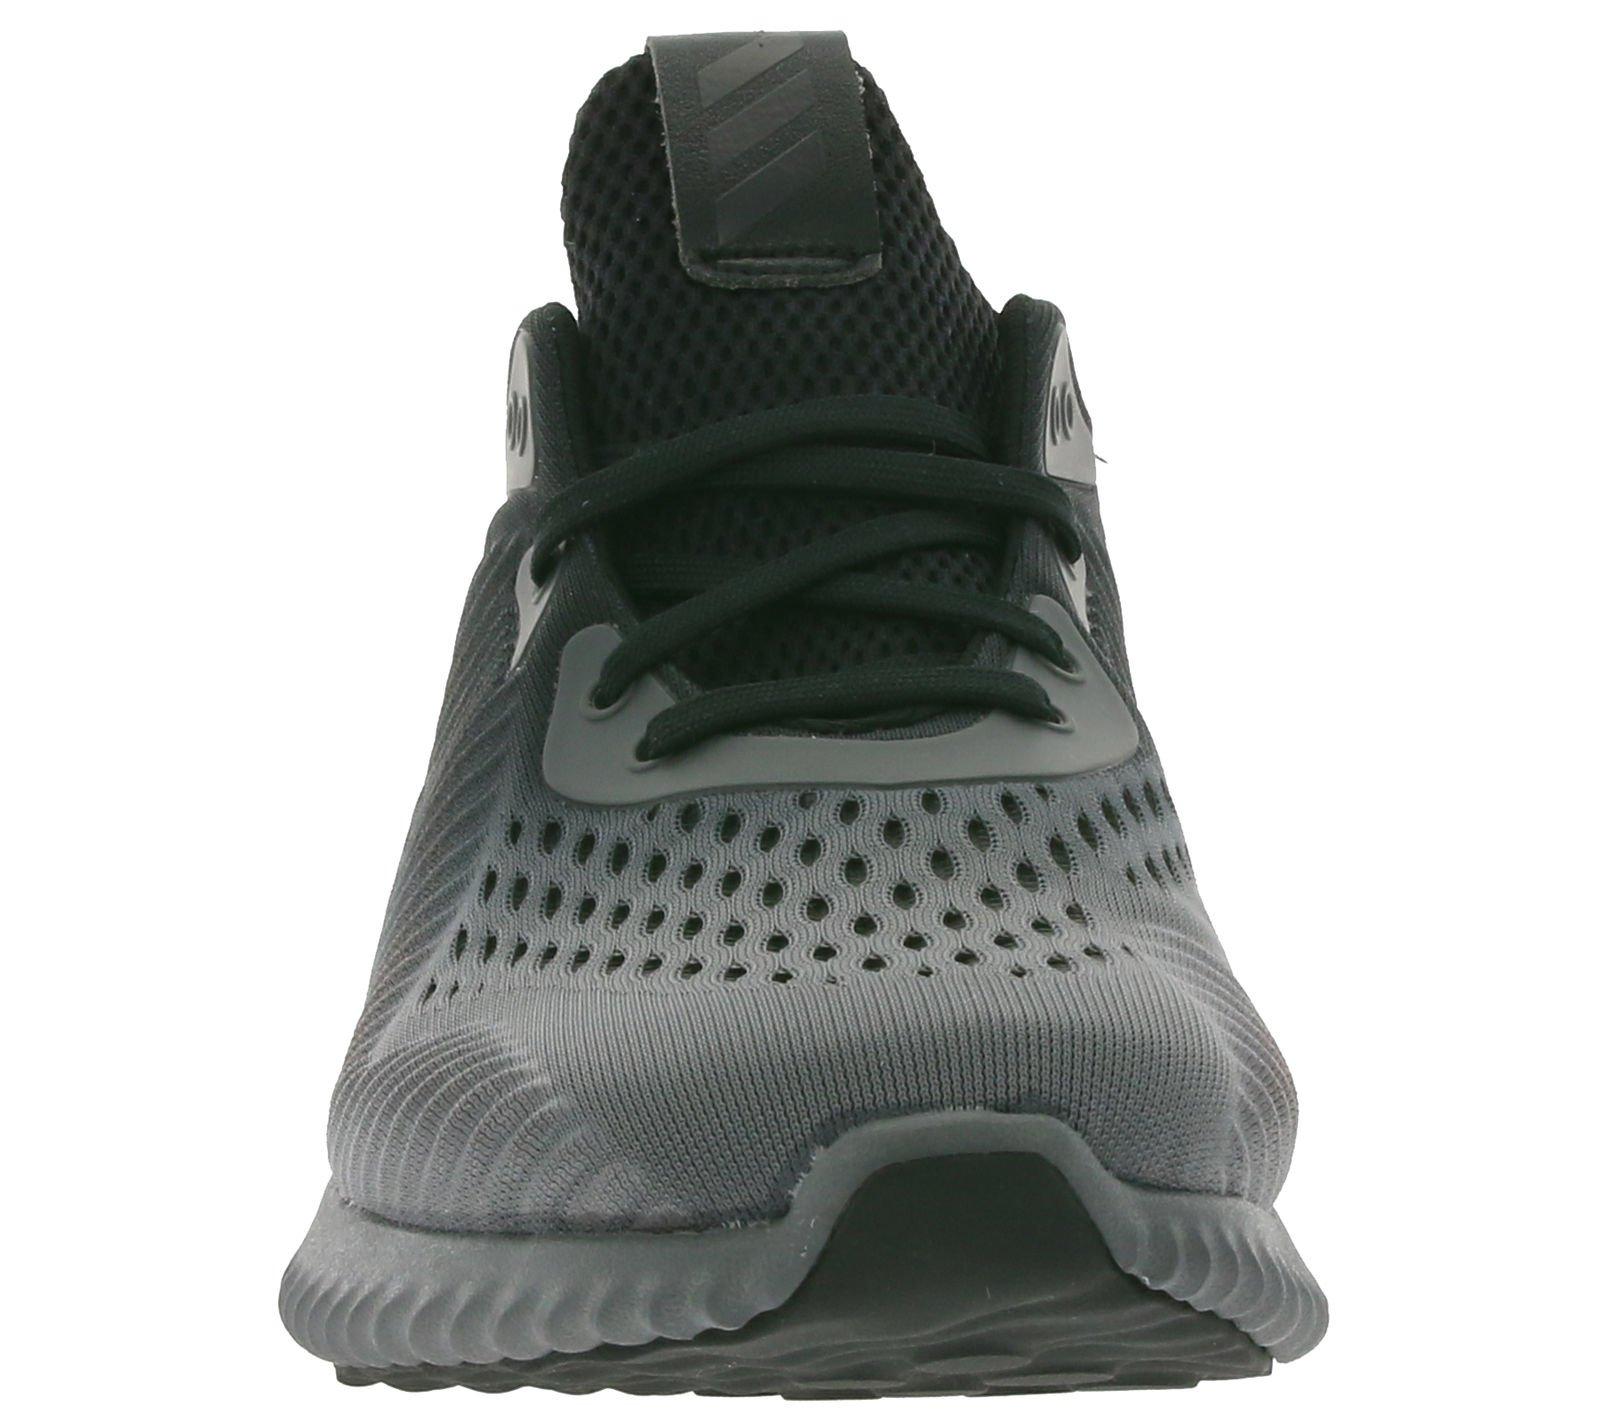 Details about Adidas Performance Alphabounce Engineered Mesh Mens Schuhe Herren Schwarz BY4263